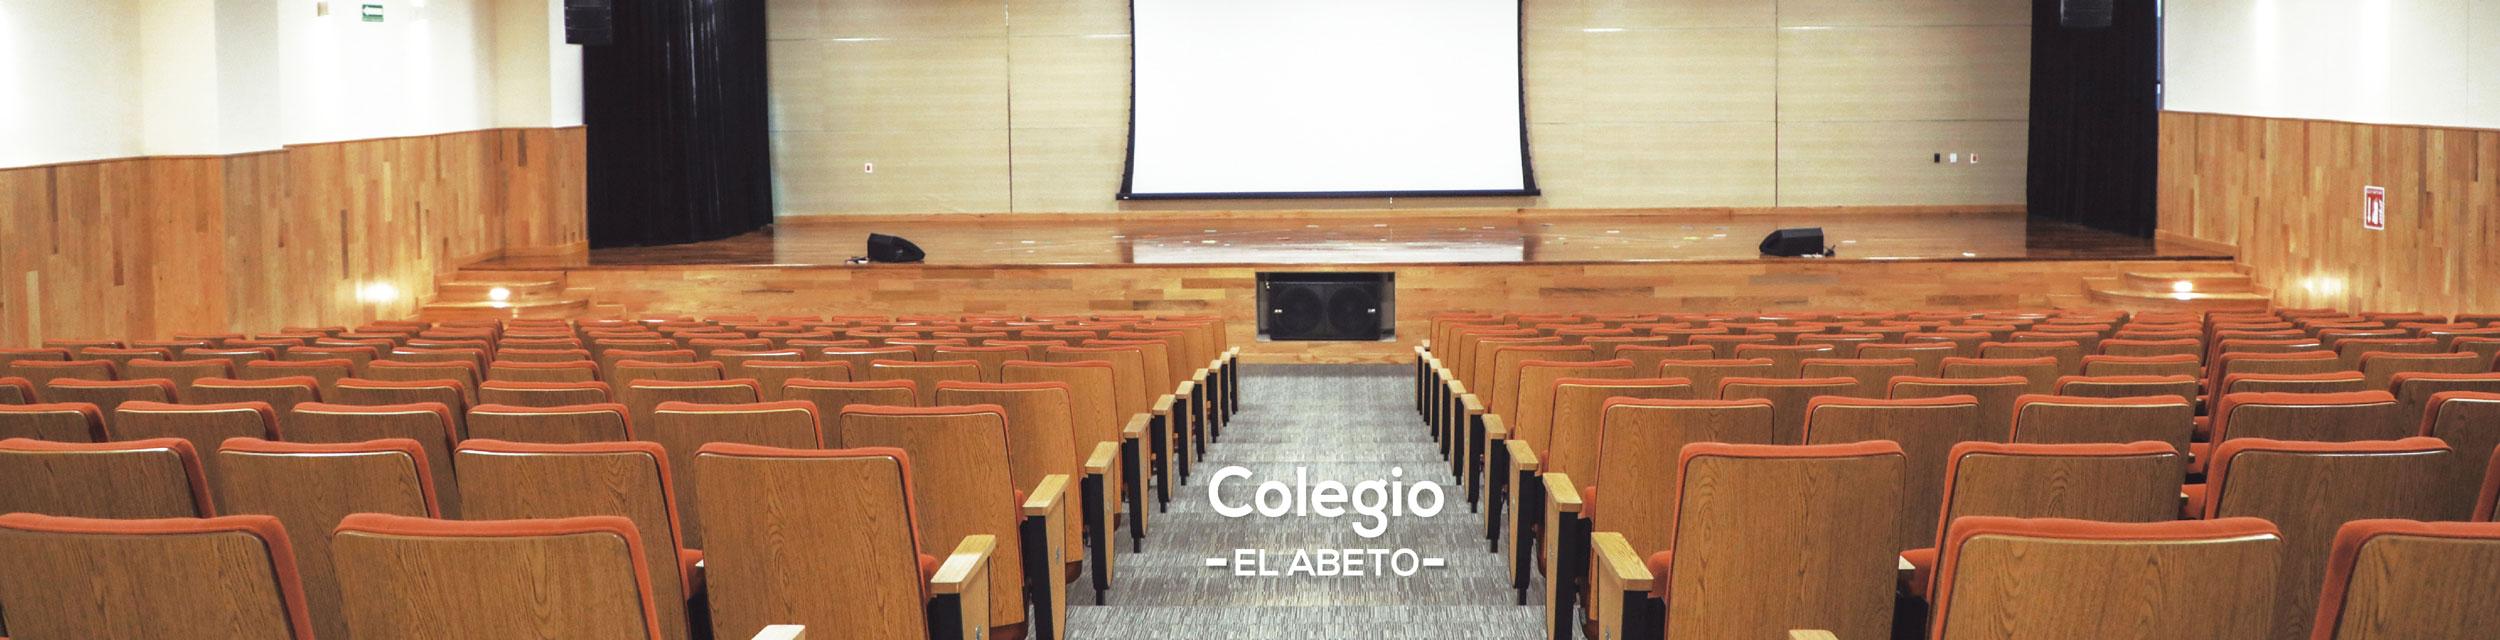 banner-arriba-03